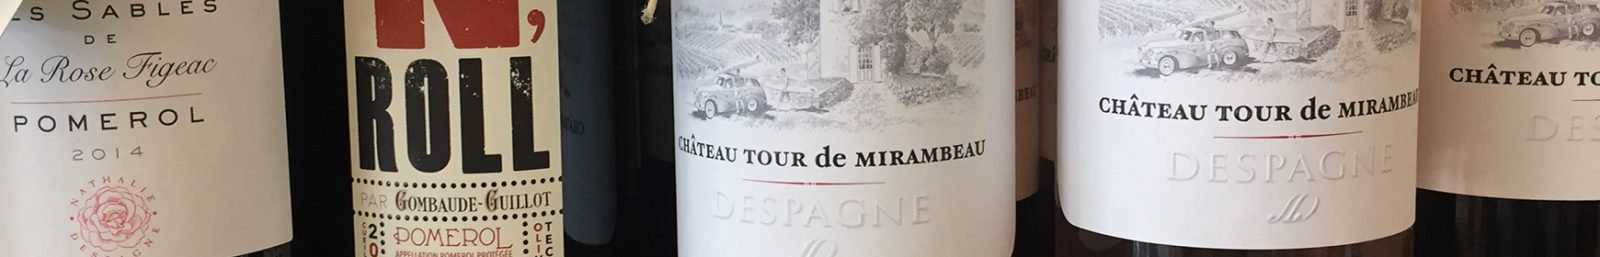 Weinflaschen Bordeaux